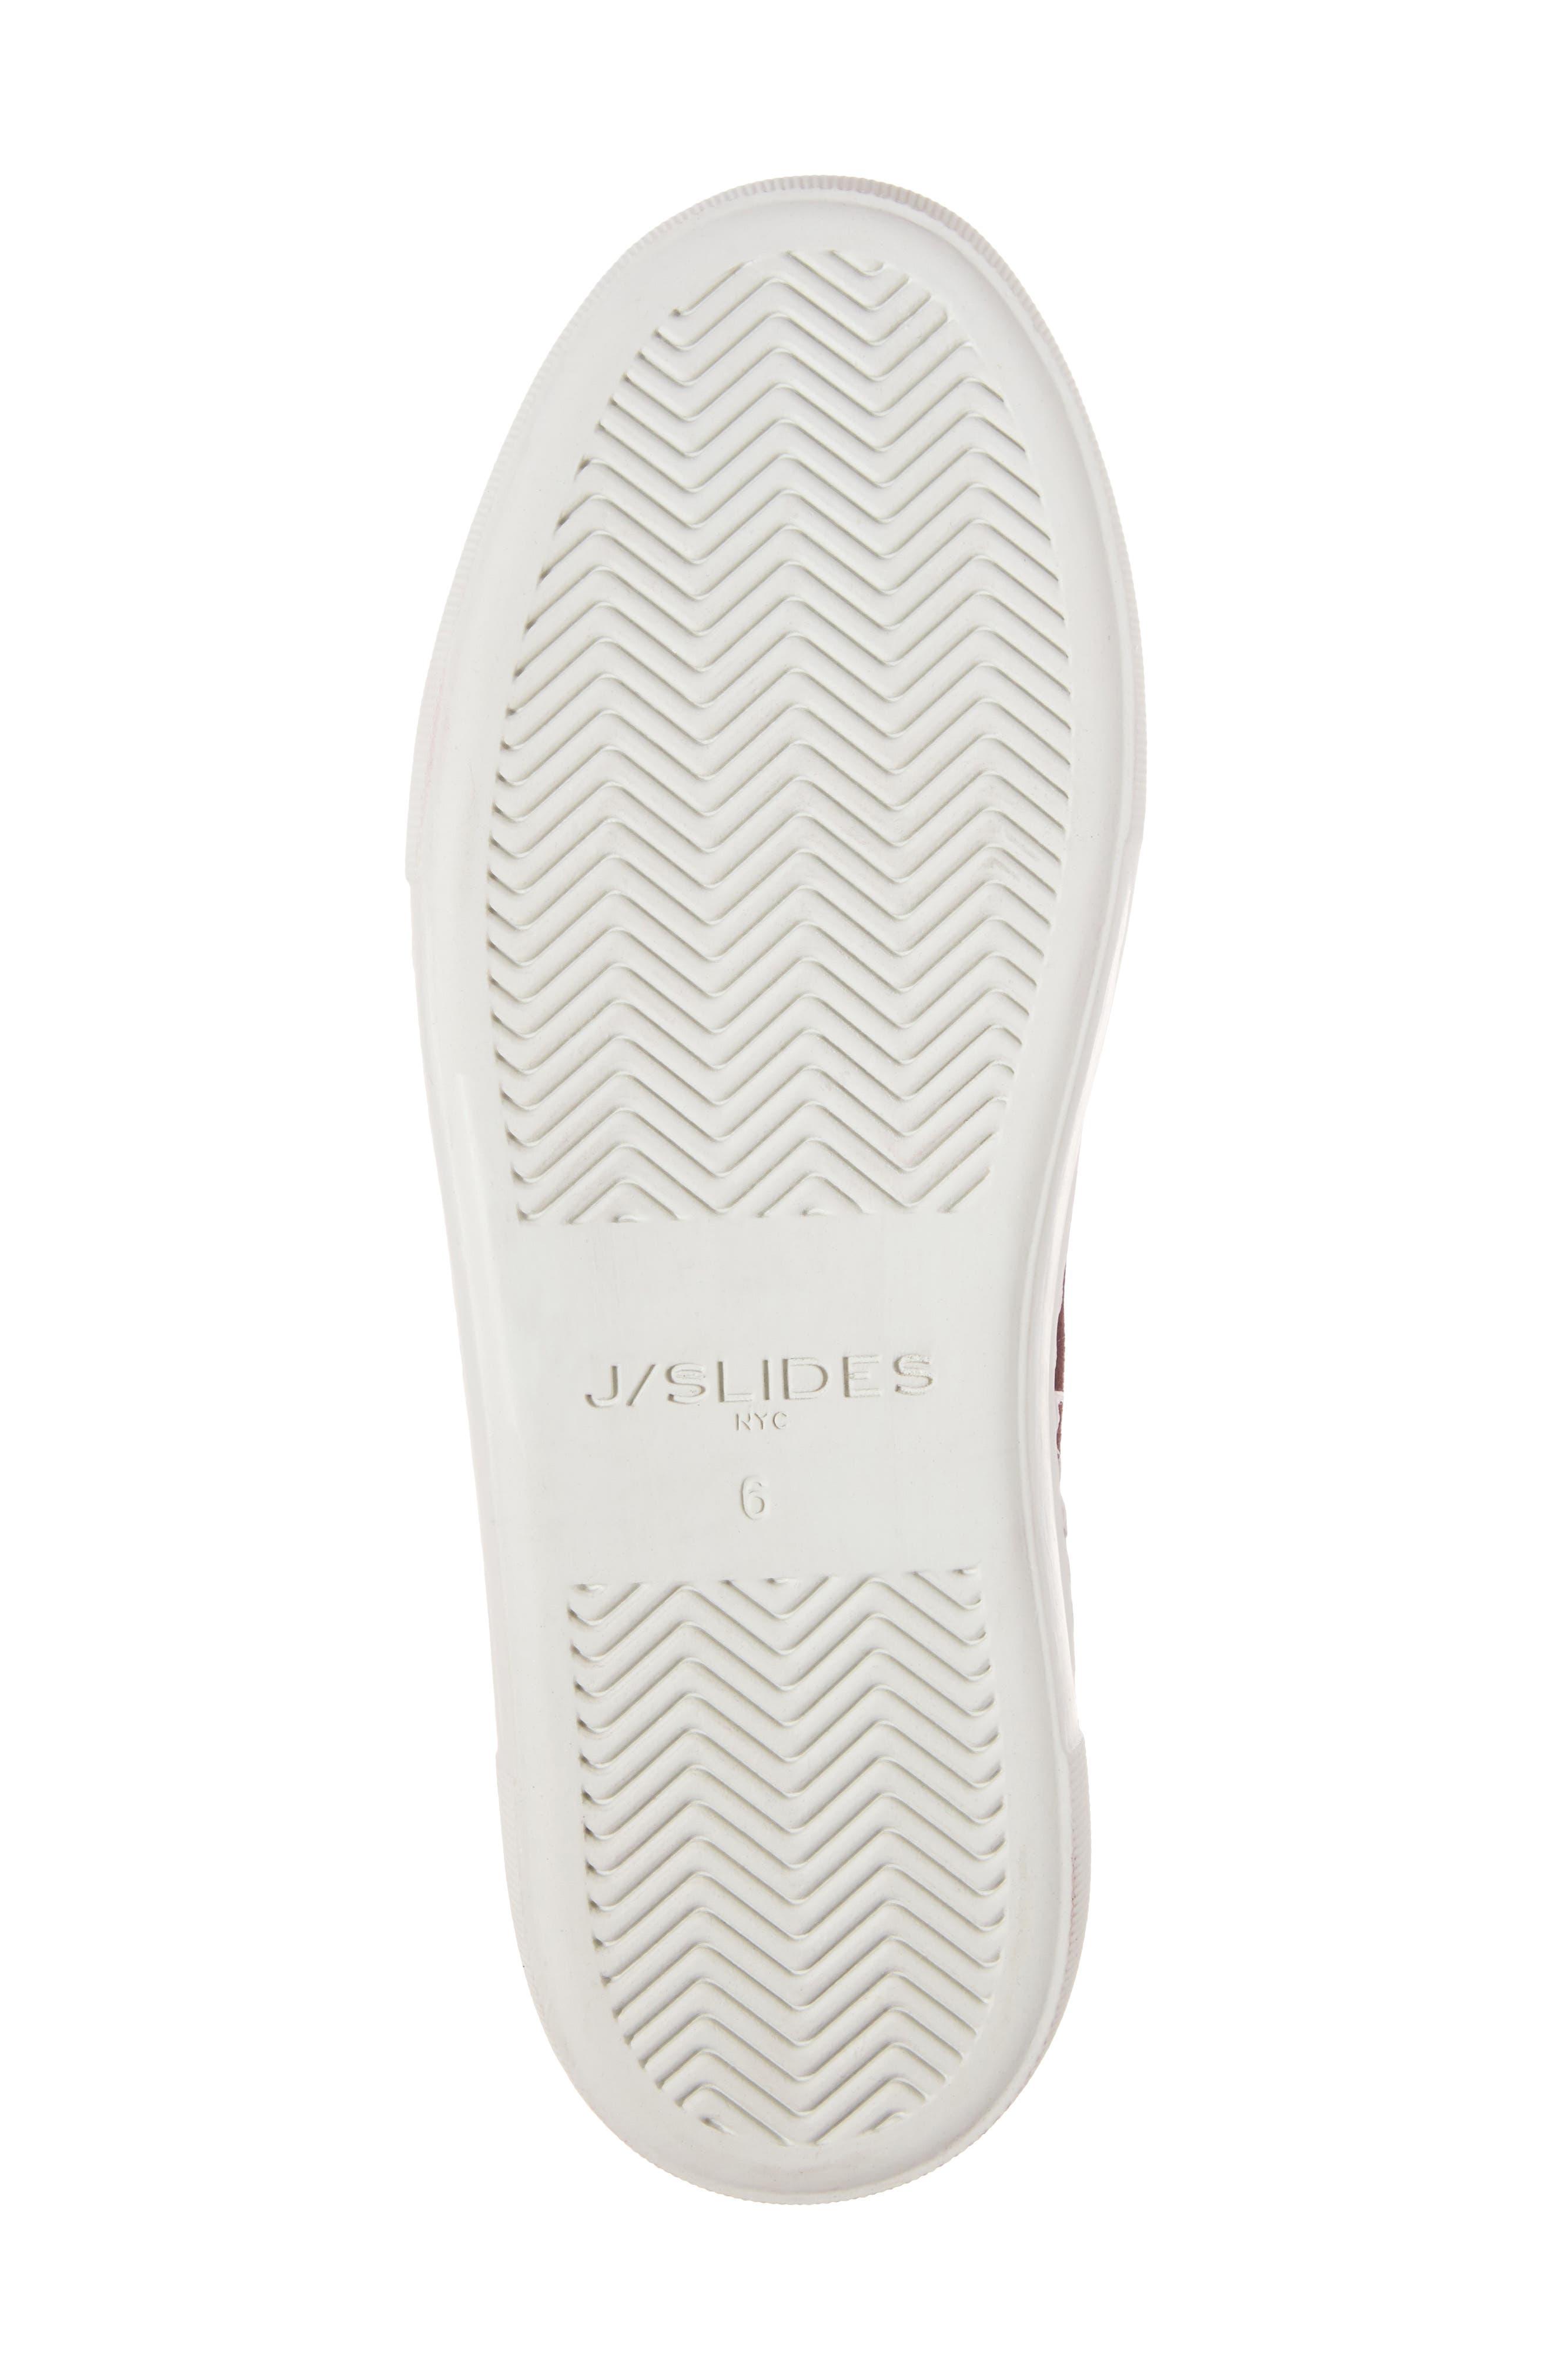 Alexi Faux Fur Slip-On Sneaker,                             Alternate thumbnail 6, color,                             Burgundy Suede